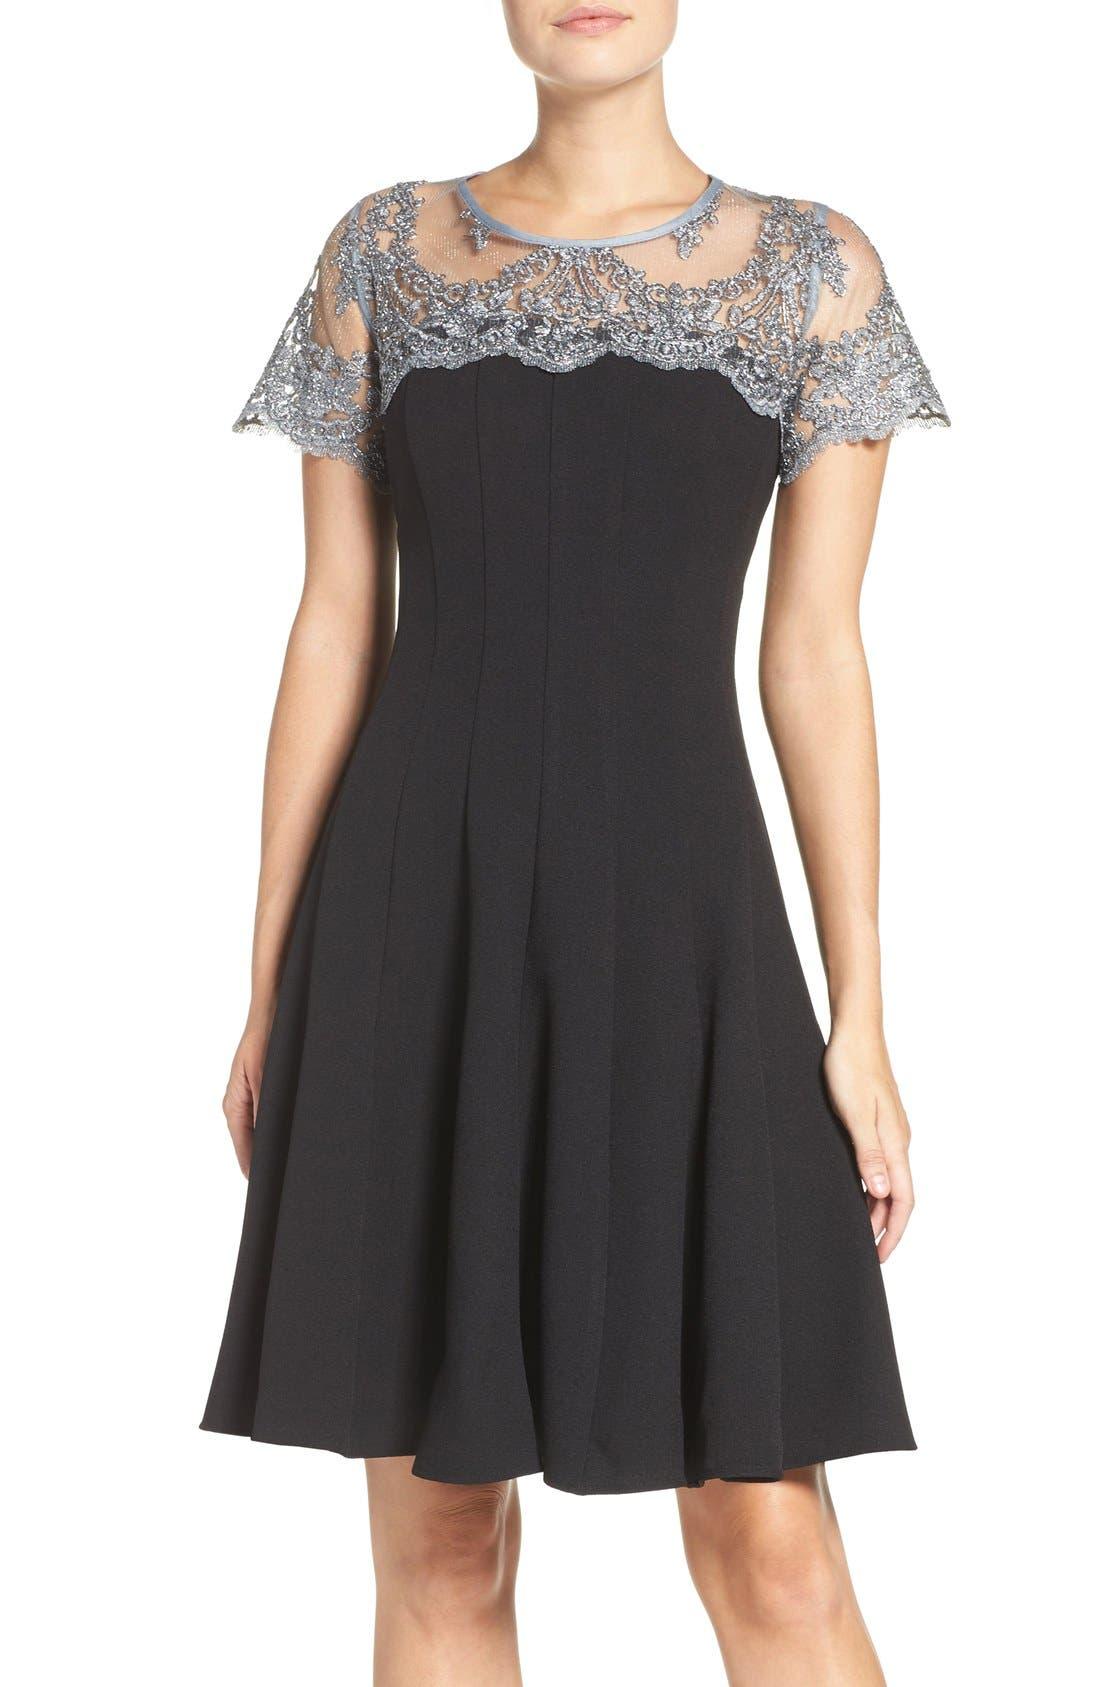 Alternate Image 1 Selected - Chetta B Lace Yoke Fit & Flare Dress